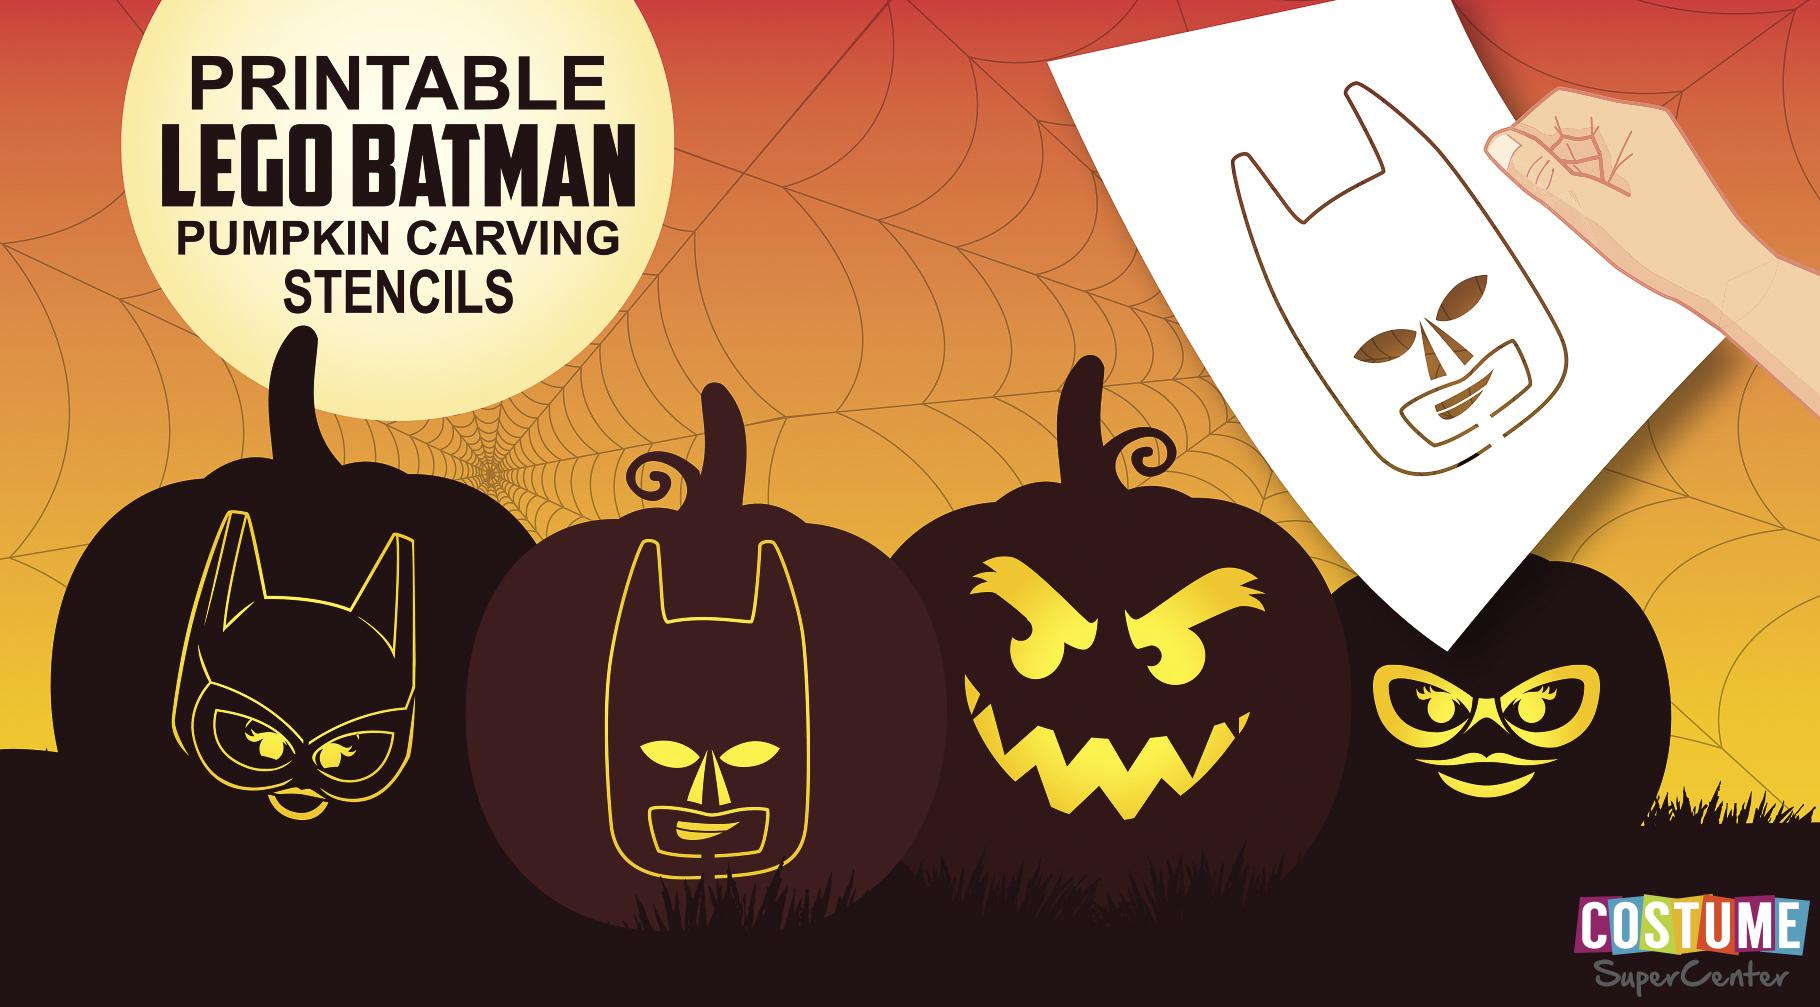 Free Printable Pumpkin Carving Stencils | Wildish Jess - Halloween Pumpkin Carving Stencils Free Printable